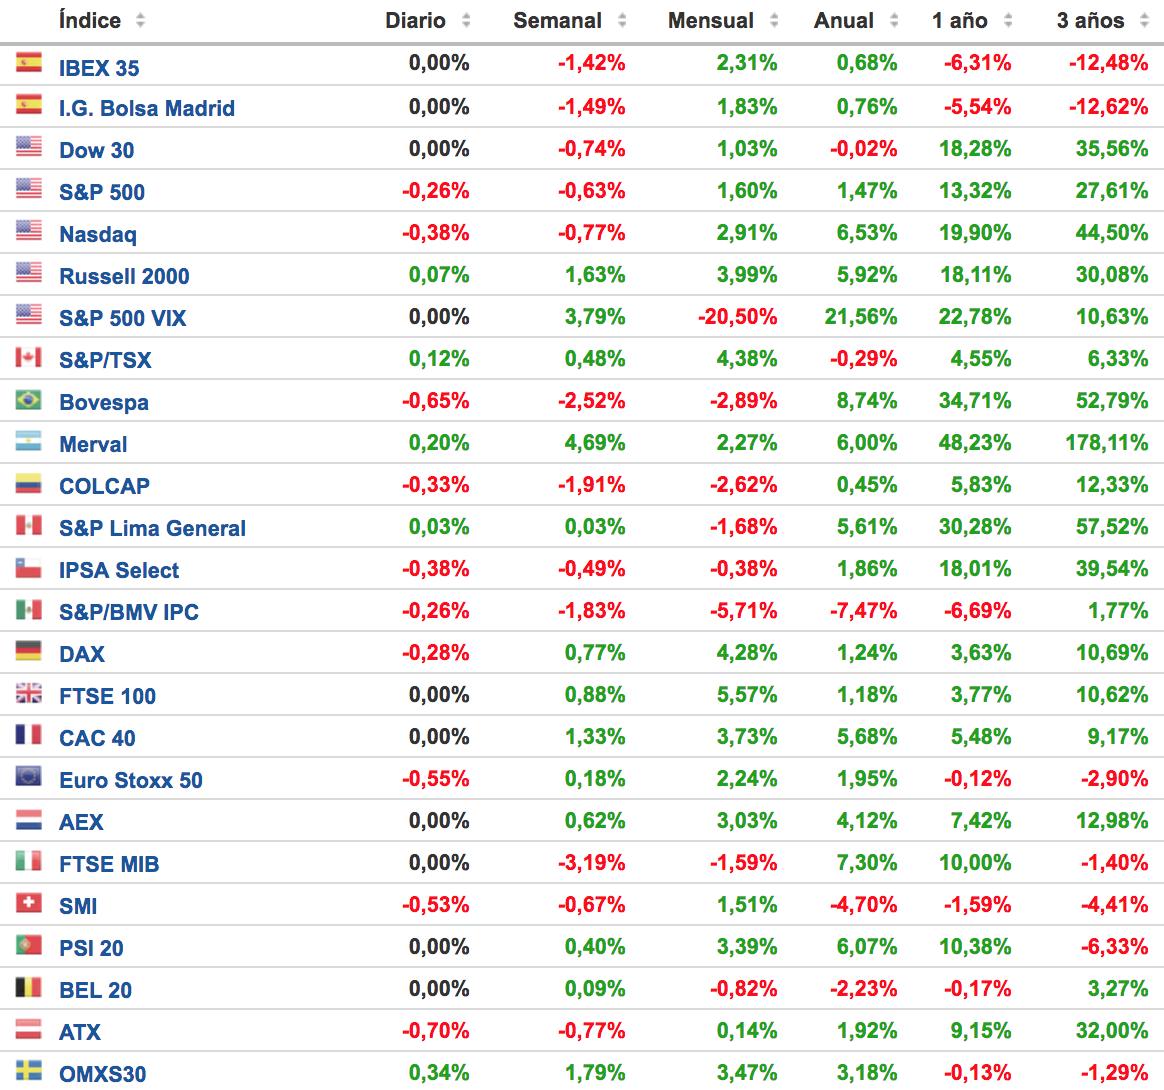 principales indices bursatiles 21 mayo 2018 Altair Finance